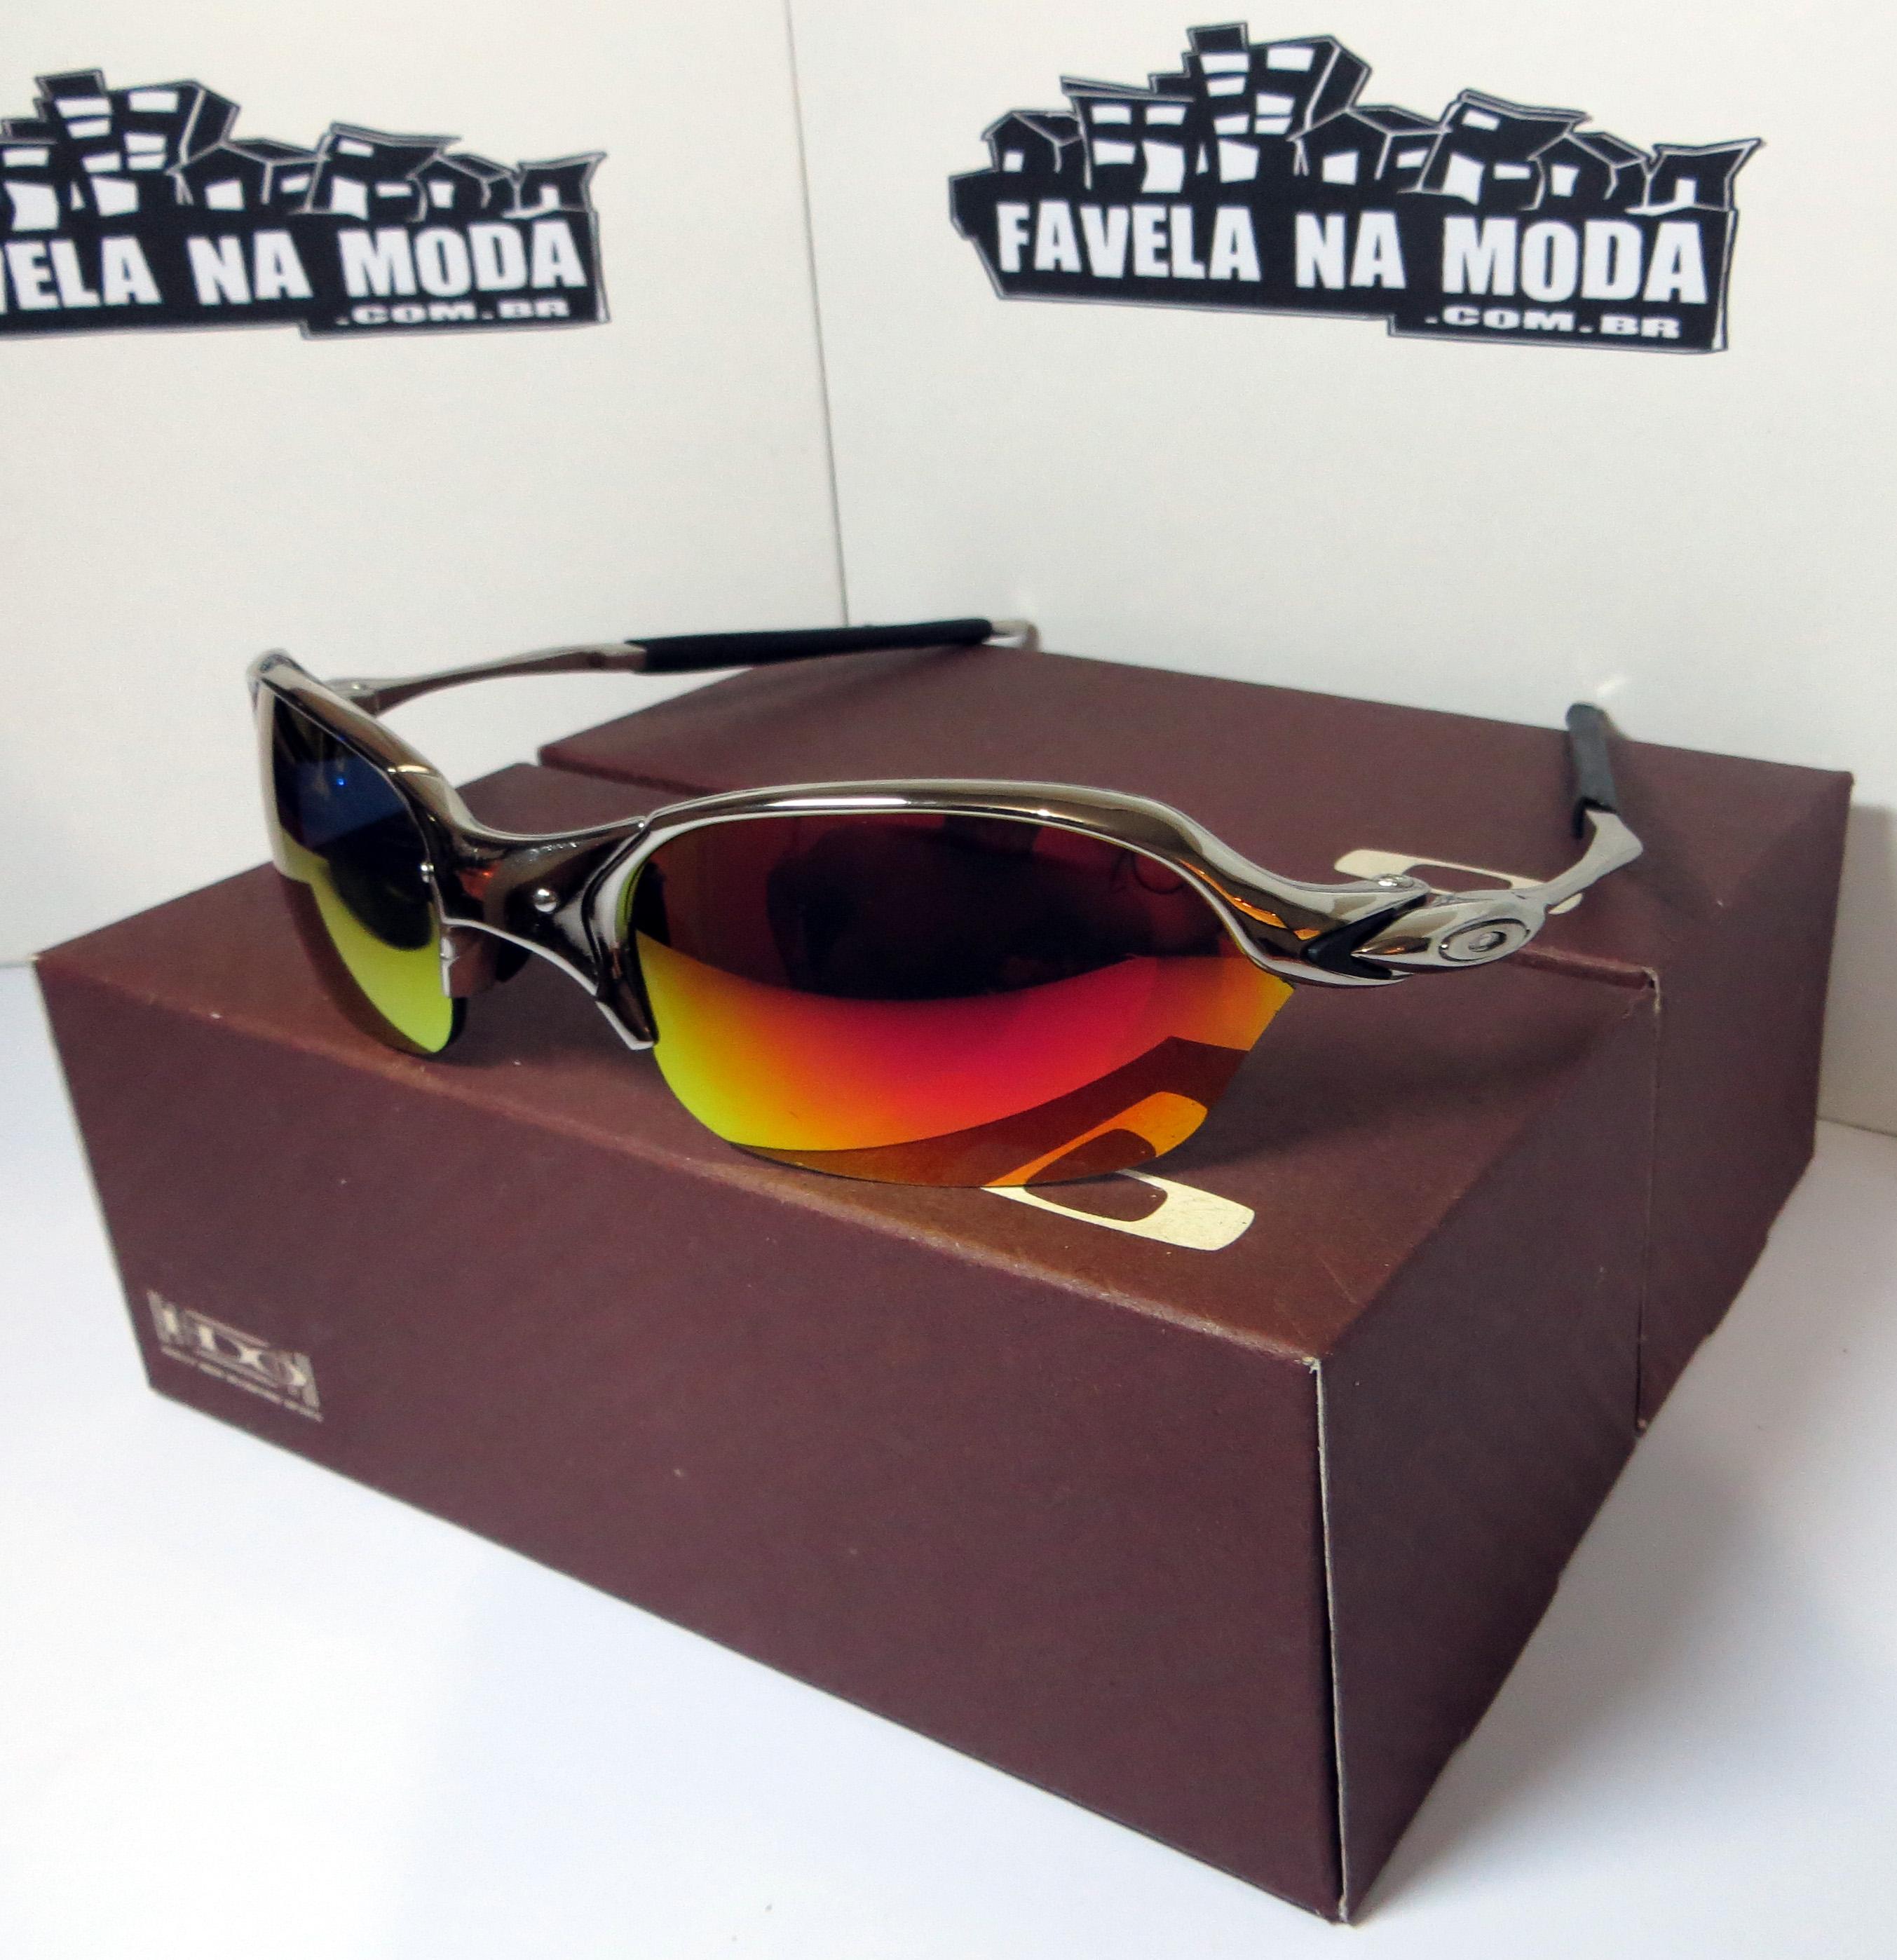 ee02750dd787c Óculos Oakley Romeo 2 - Polished   Dark Ruby   Borrachinhas Pretas ...